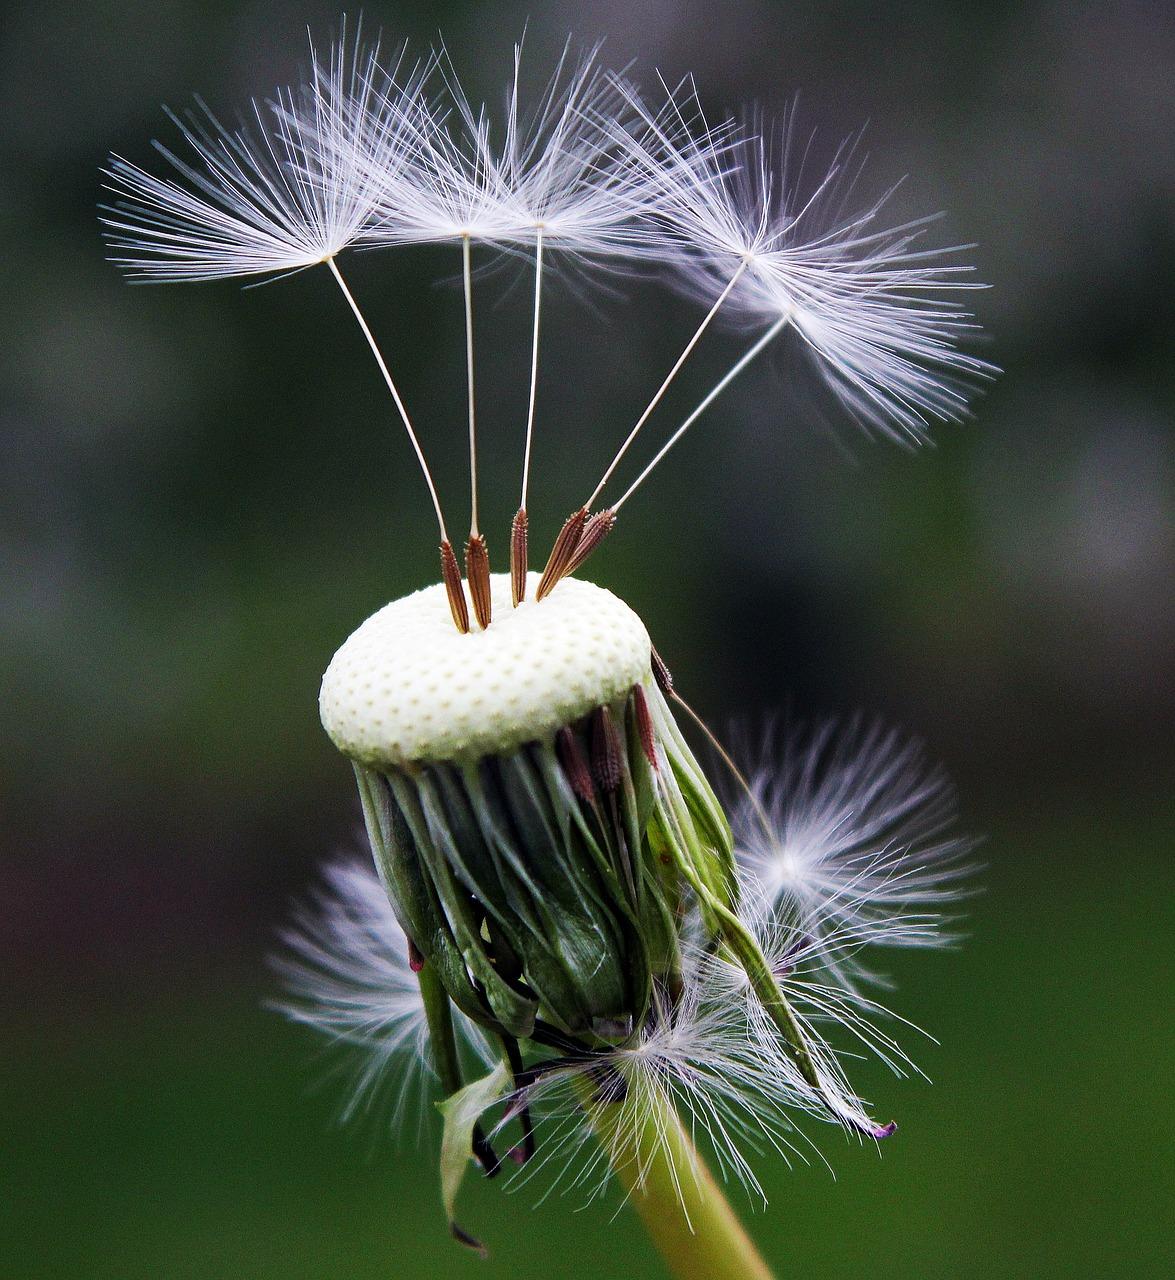 dandelion-1392492_1280